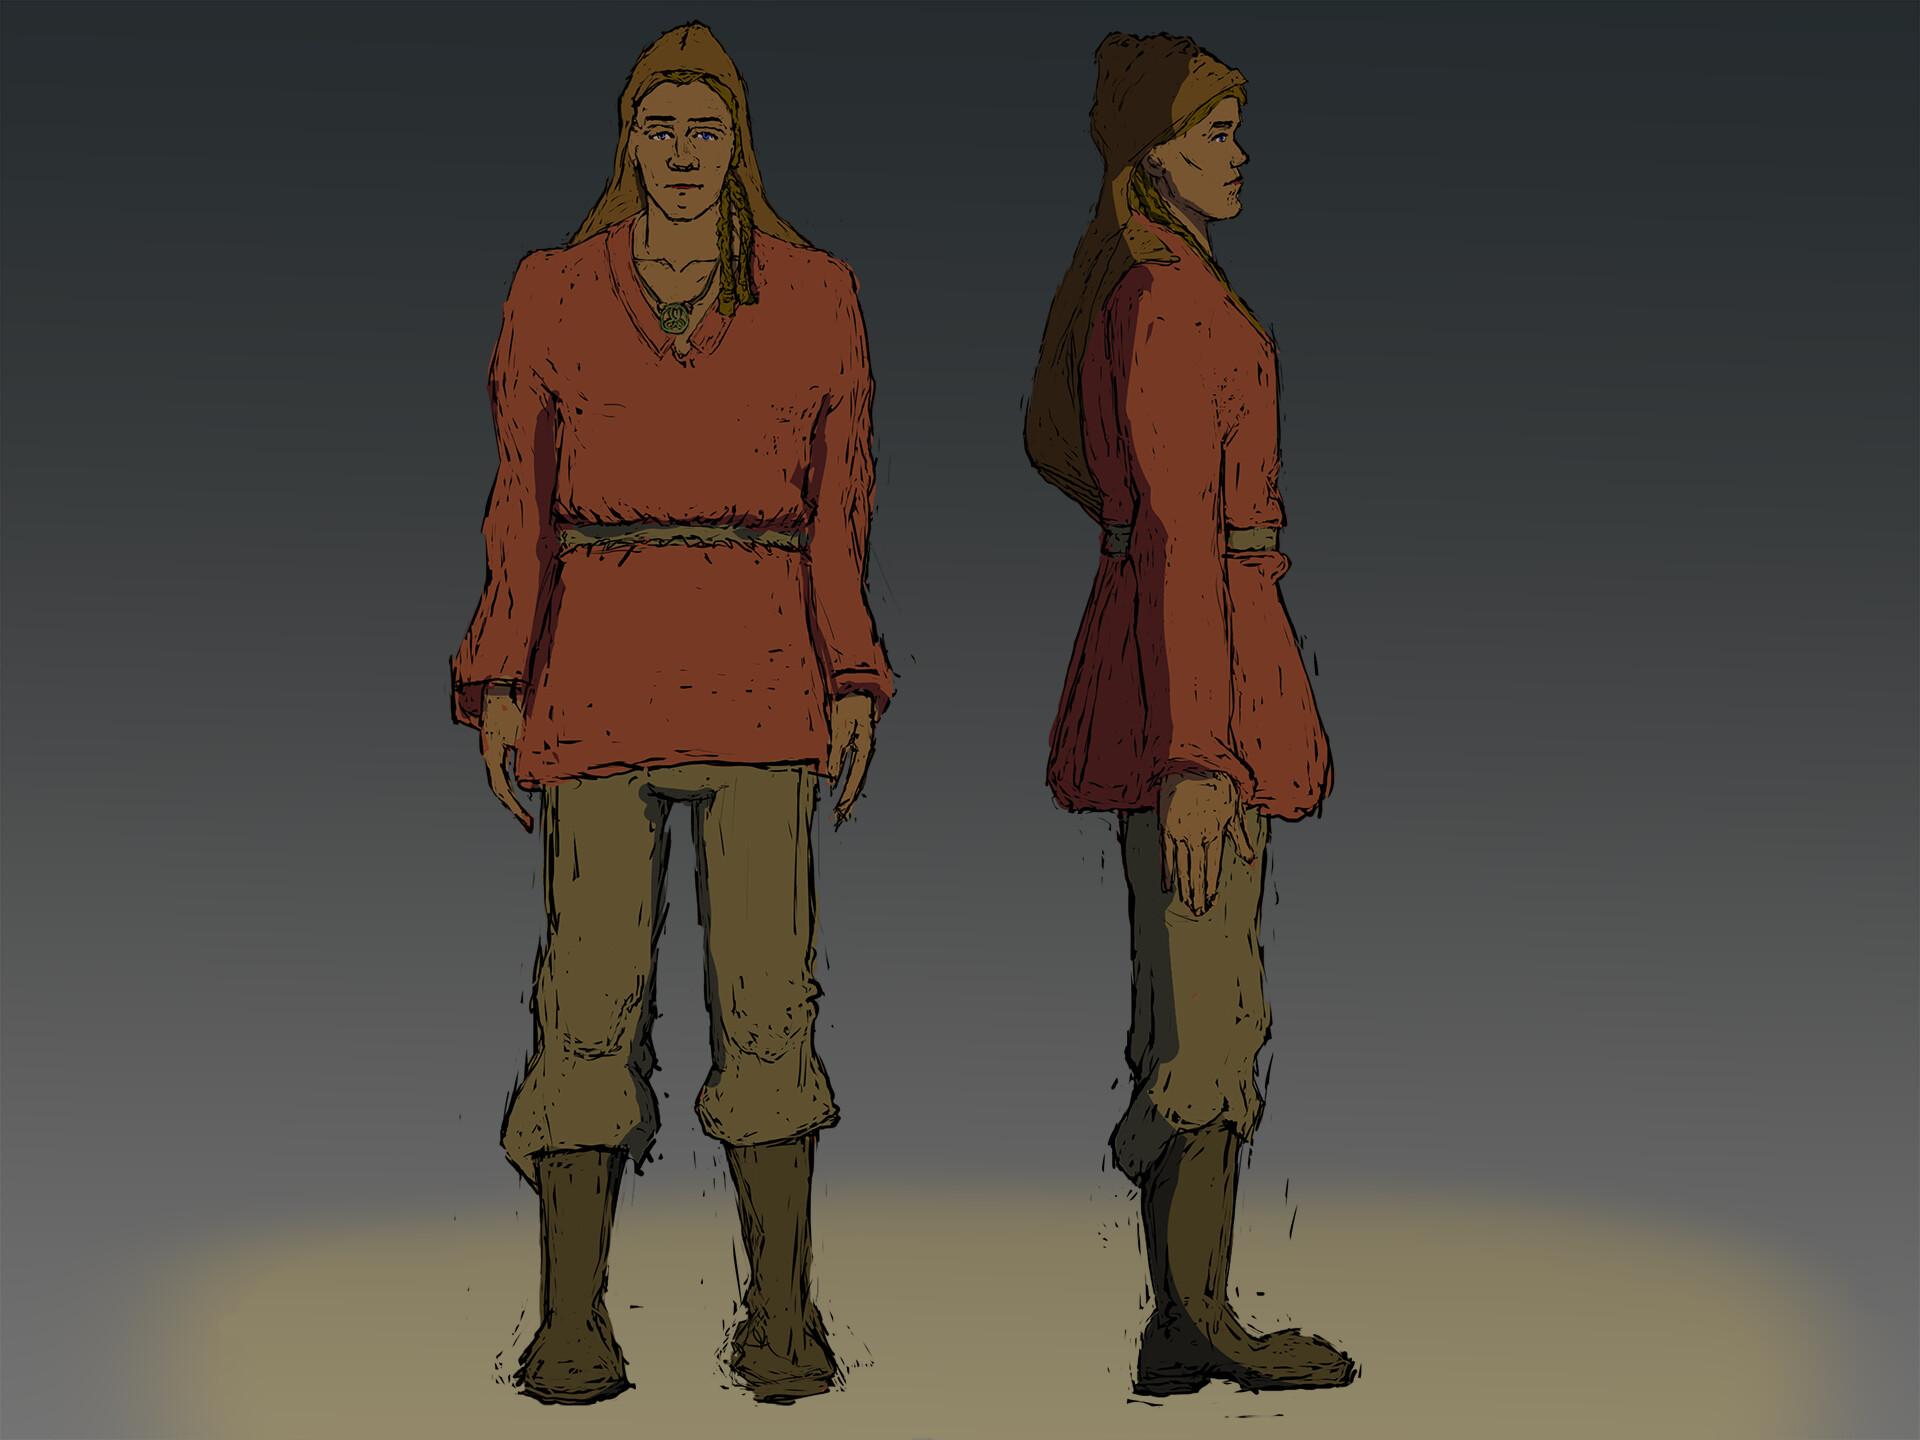 ArtStation - King Arthur Character Concept Challenge, Paul